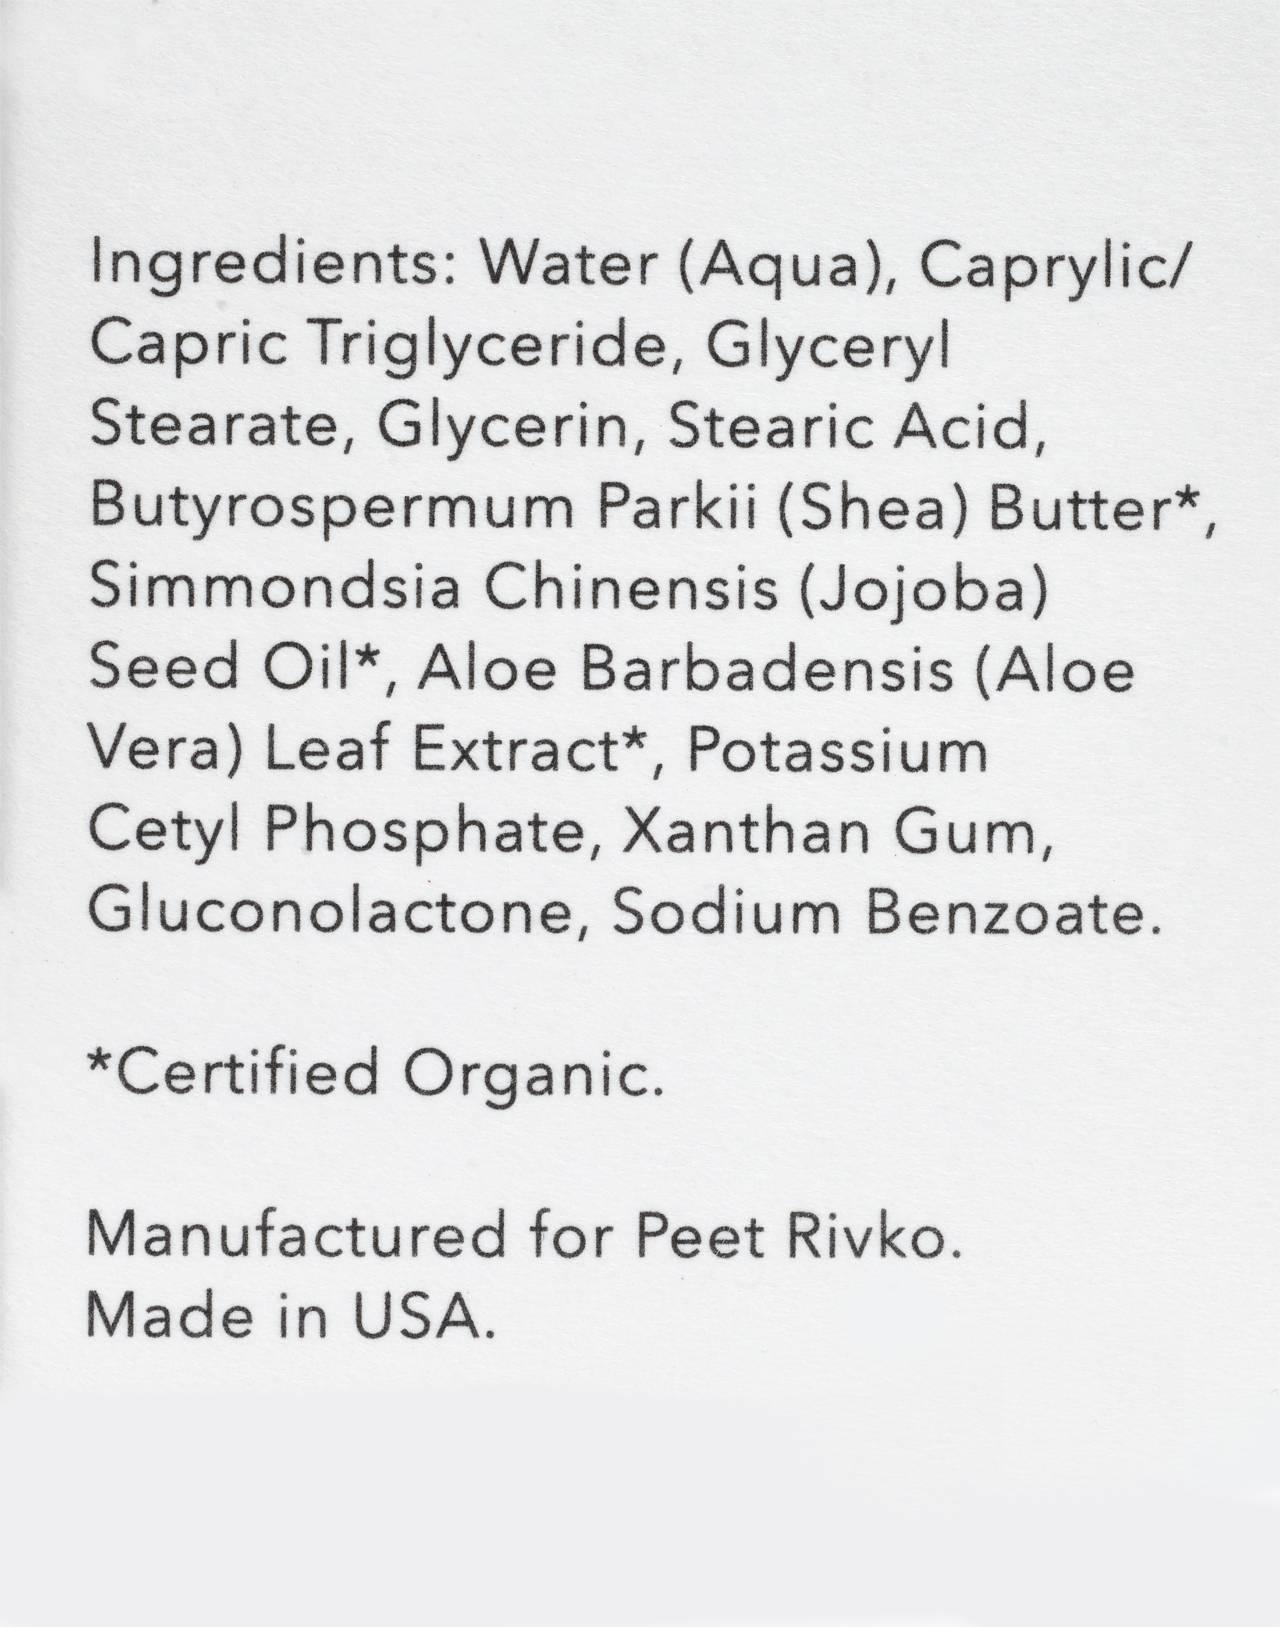 Peet Rivko® Daily Moisturizer in moisturizer image 2